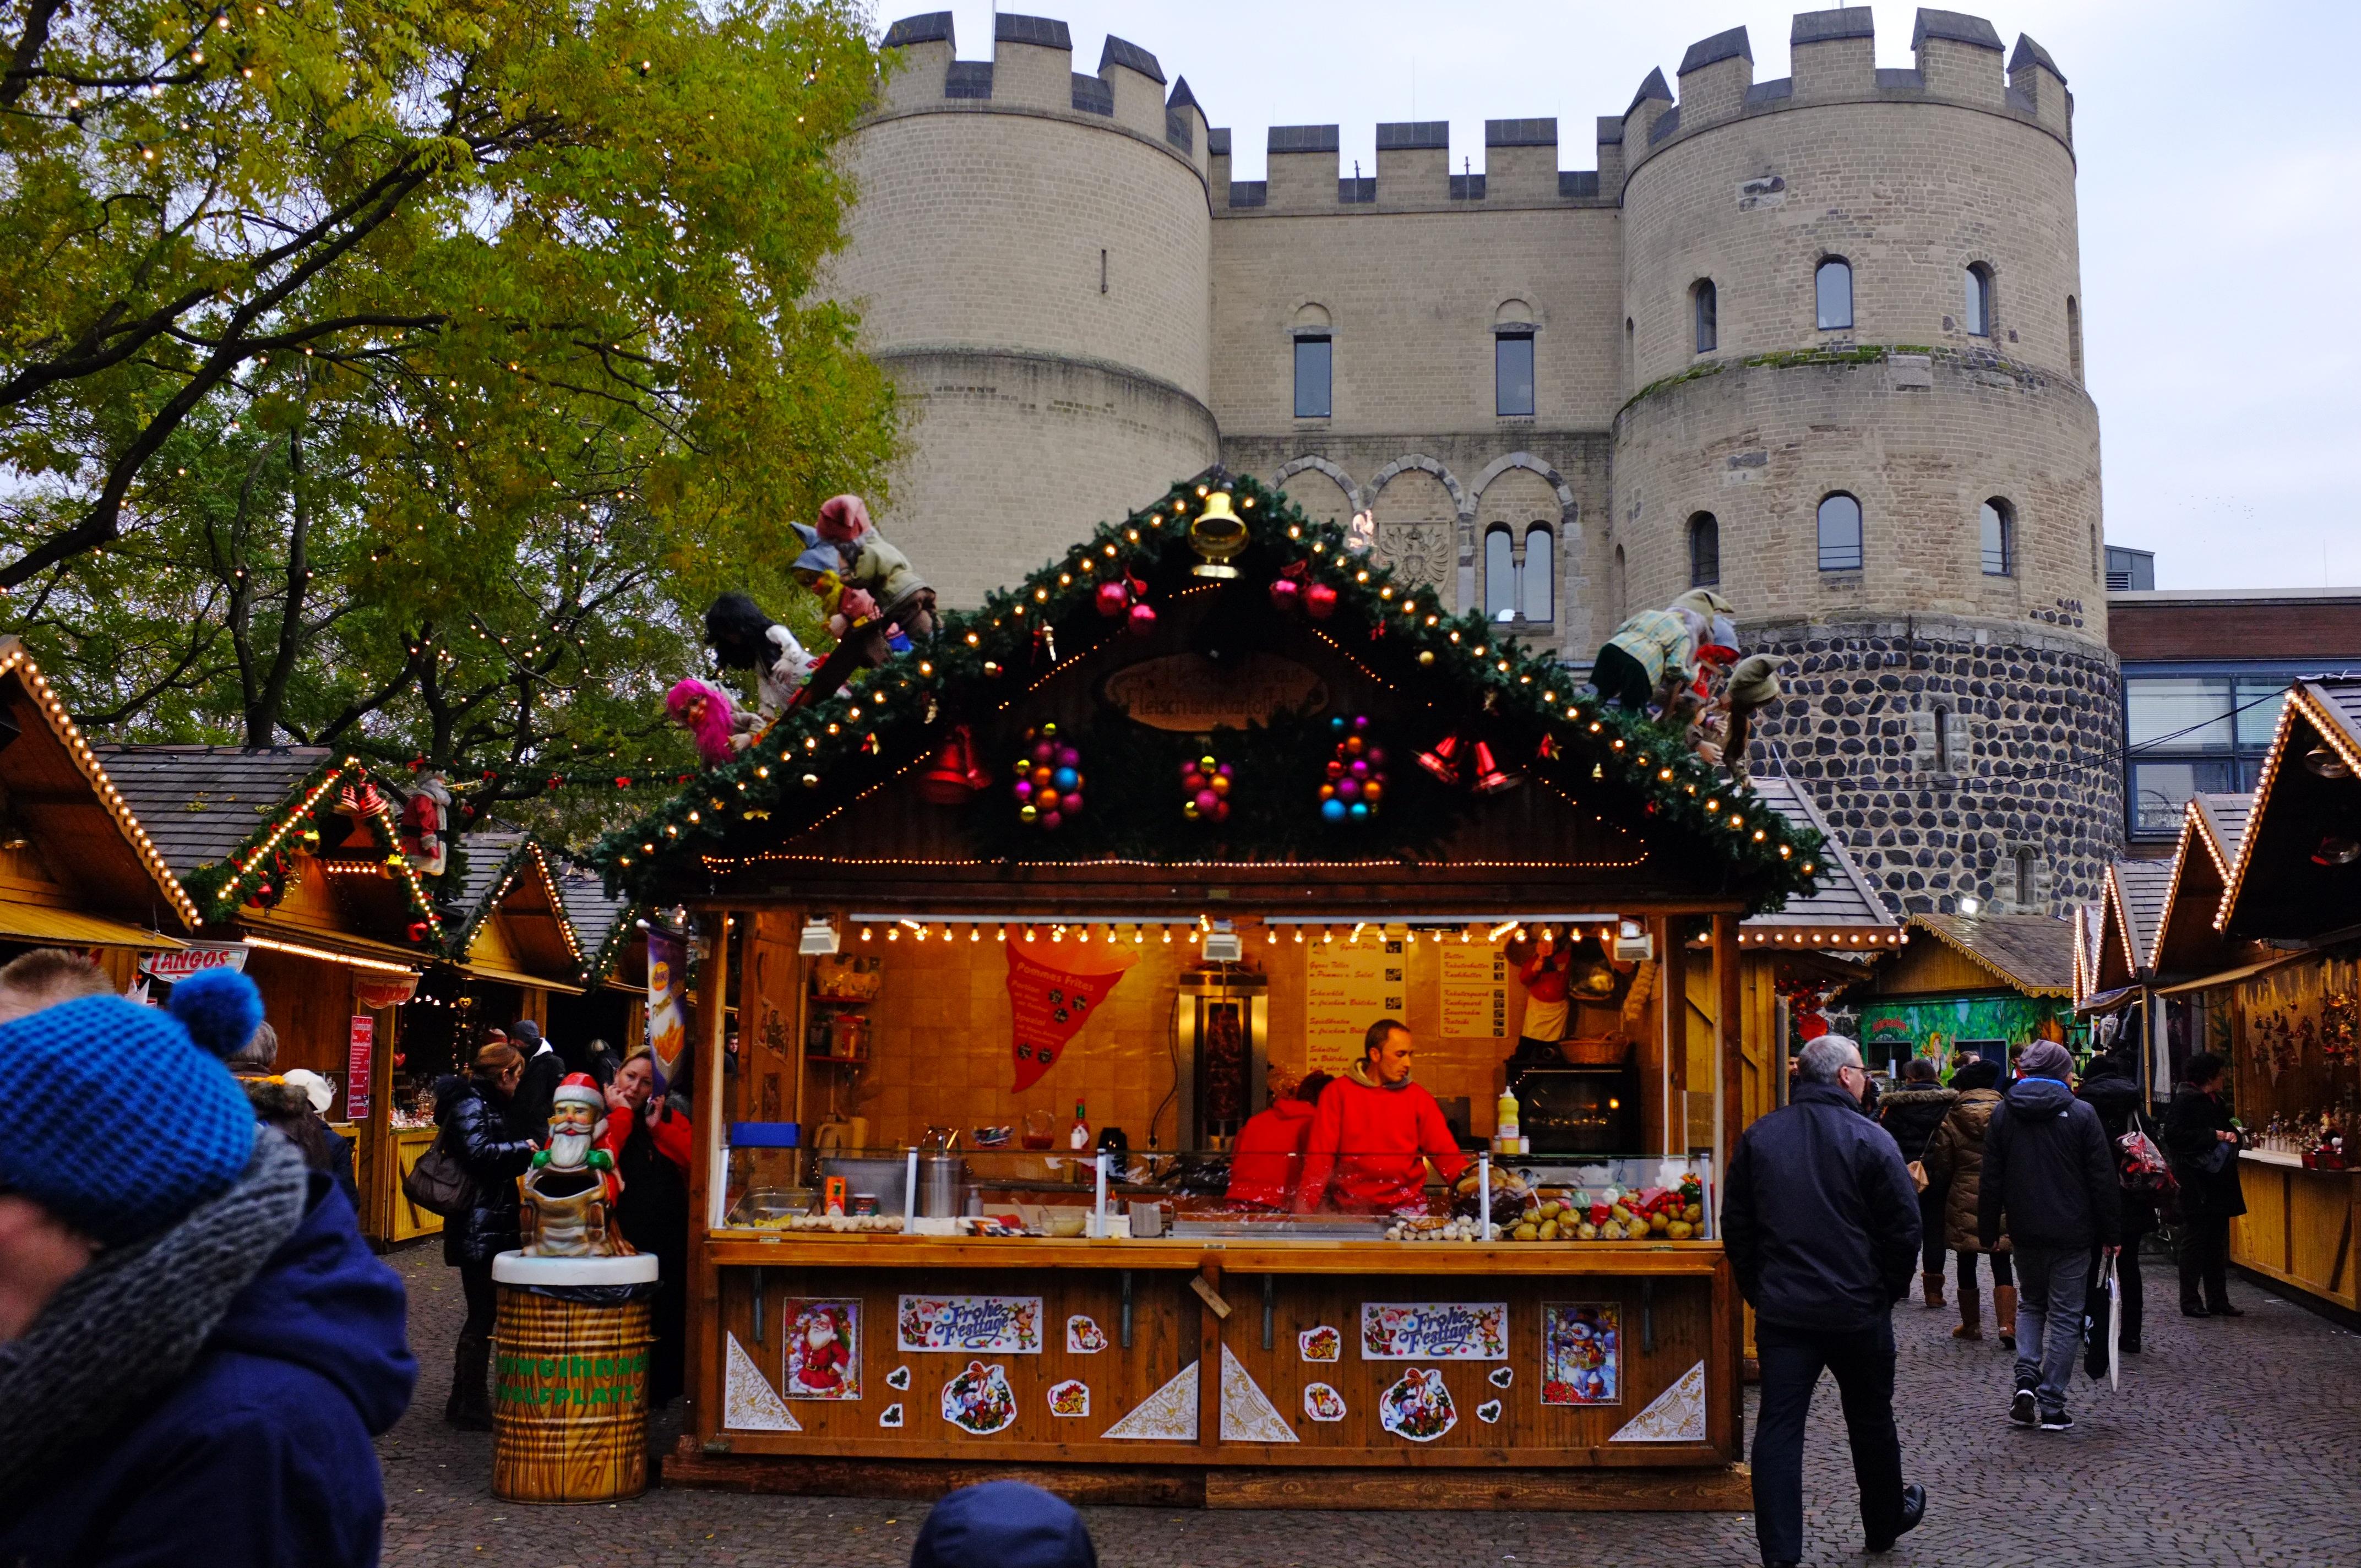 Rudolfplatz from Christmas markets of Germany